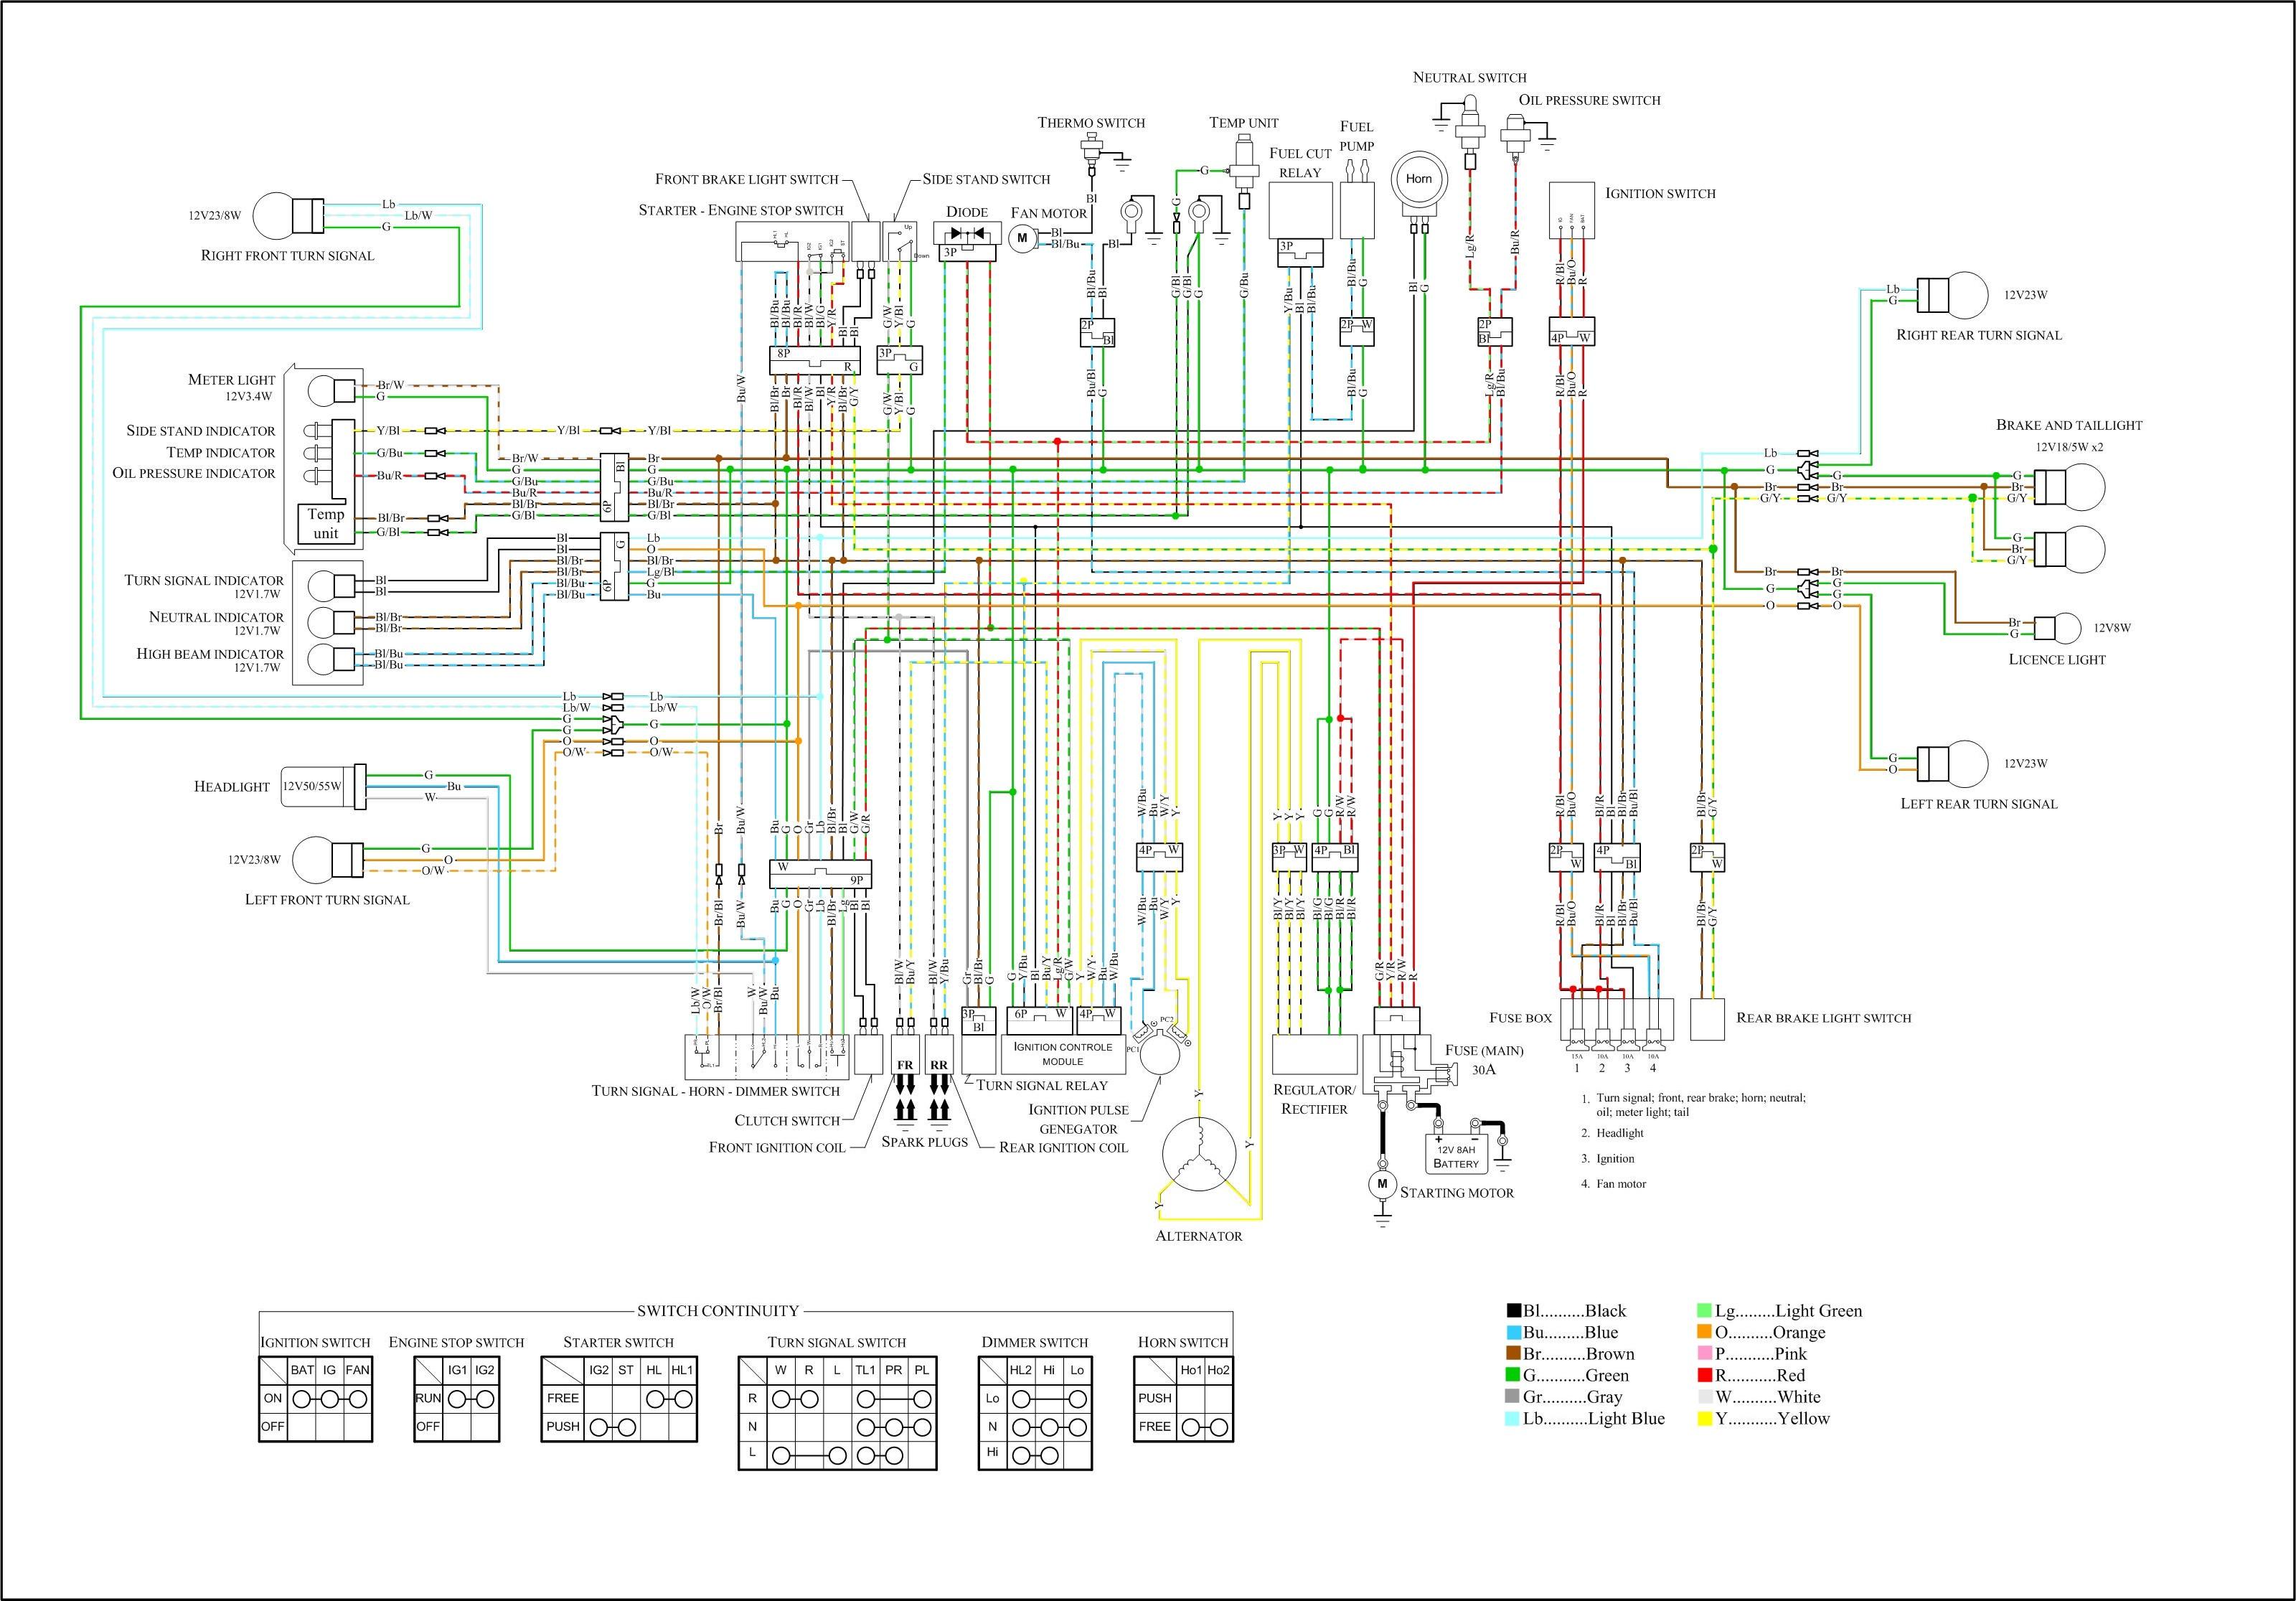 amazing 1984 honda shadow vt700 wiring diagram photos motorcycle led turn signal wiring diagram motorcycle turn signal flasher wiring diagram